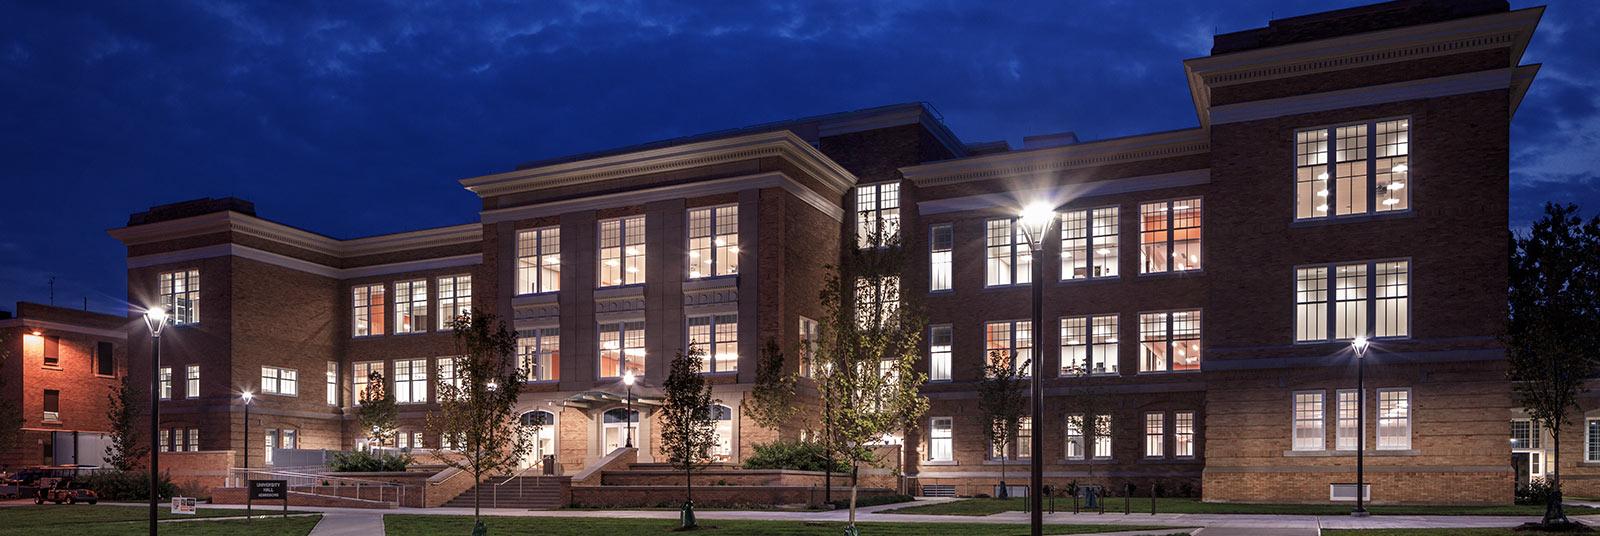 BGSU-University-Hall_Photo-1